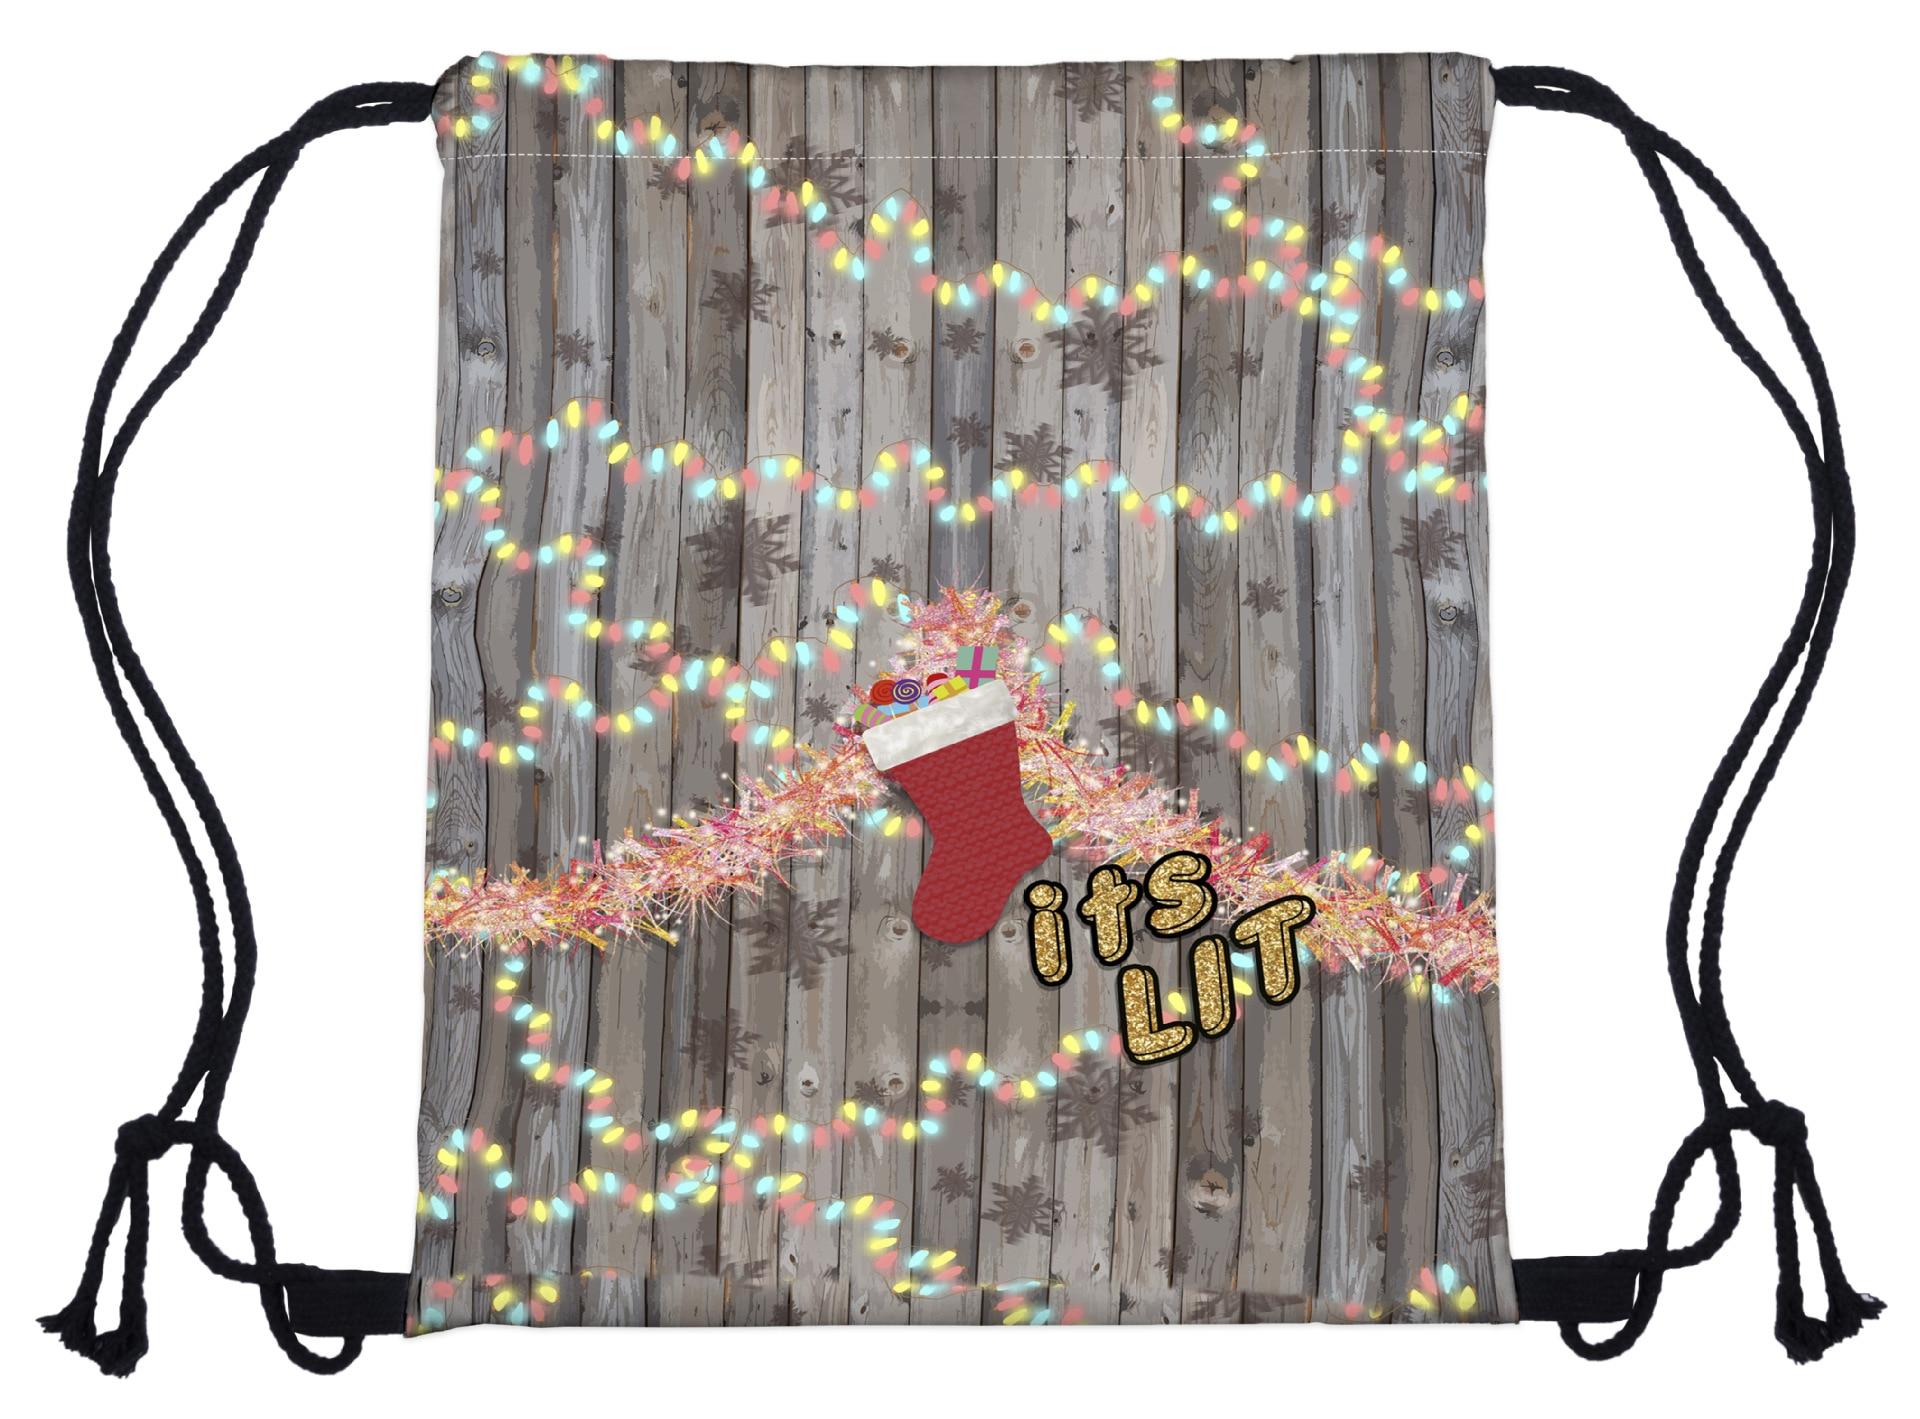 Pocketrope Bagpocket Rope Women Men Bag New Christmas Series Bundle Bag 3D Digital Printed Cartoon Christmas Tape Shoulde Bag